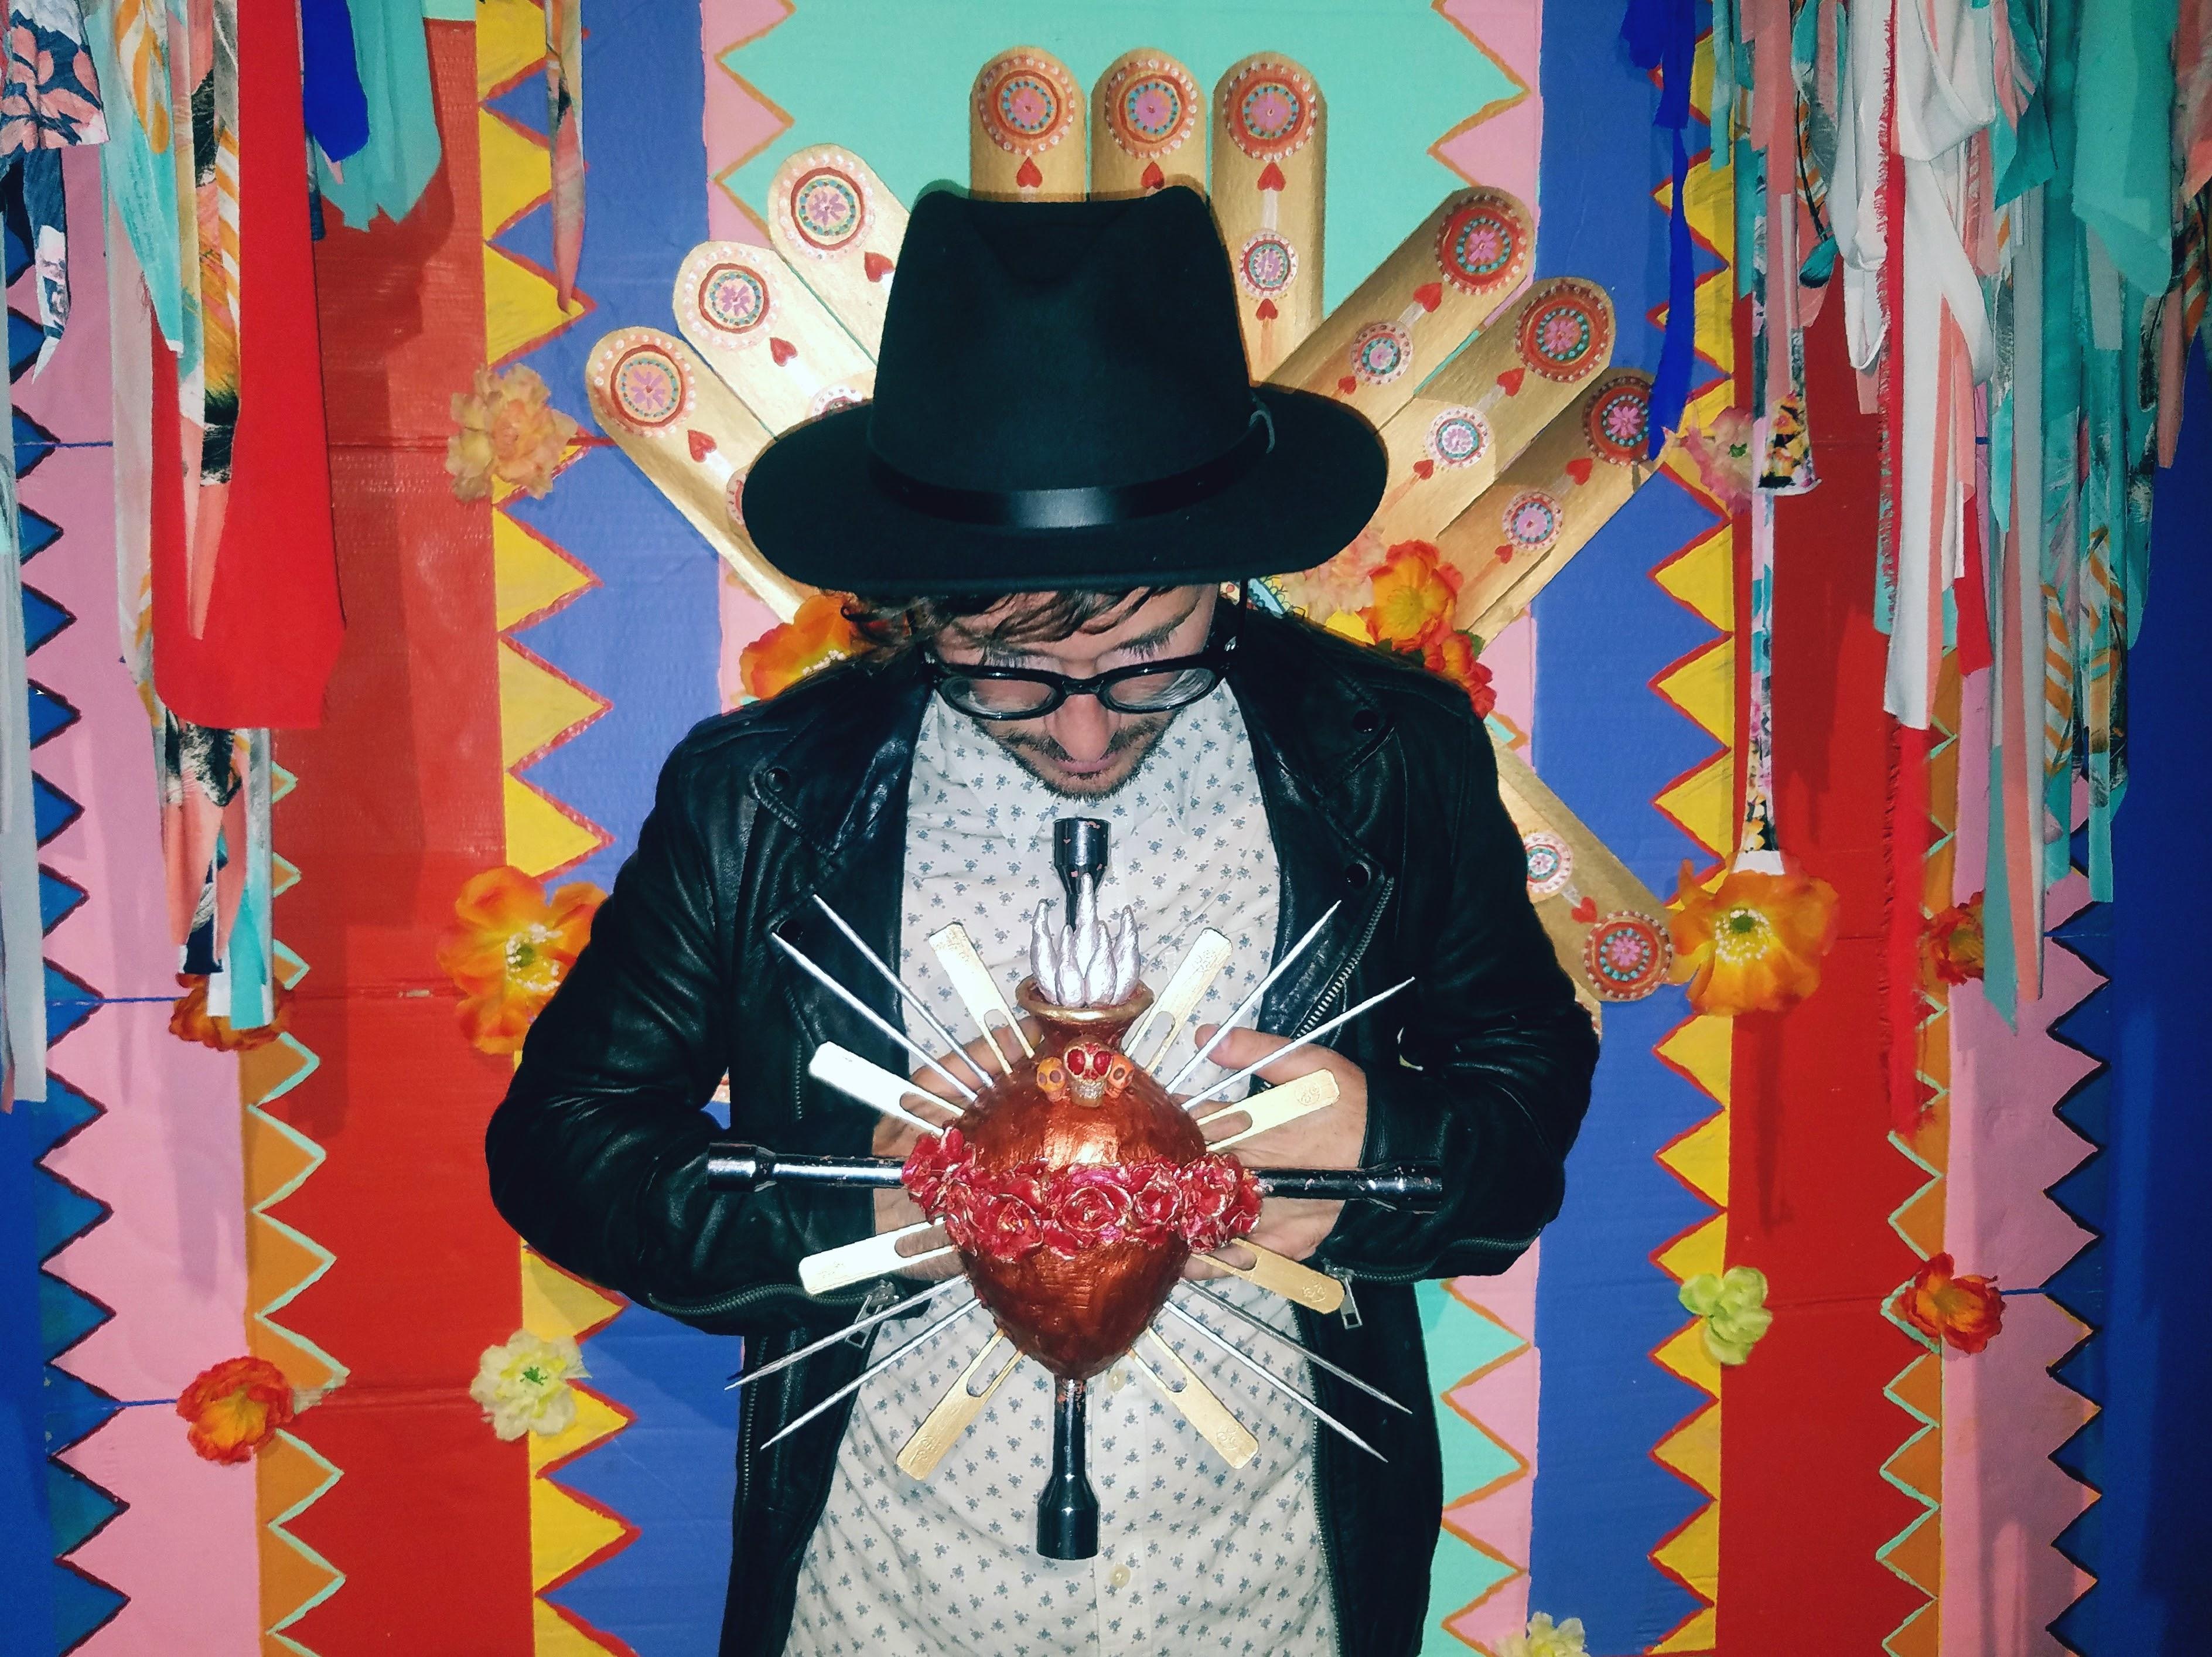 TREASURES OF THE HEART - LA